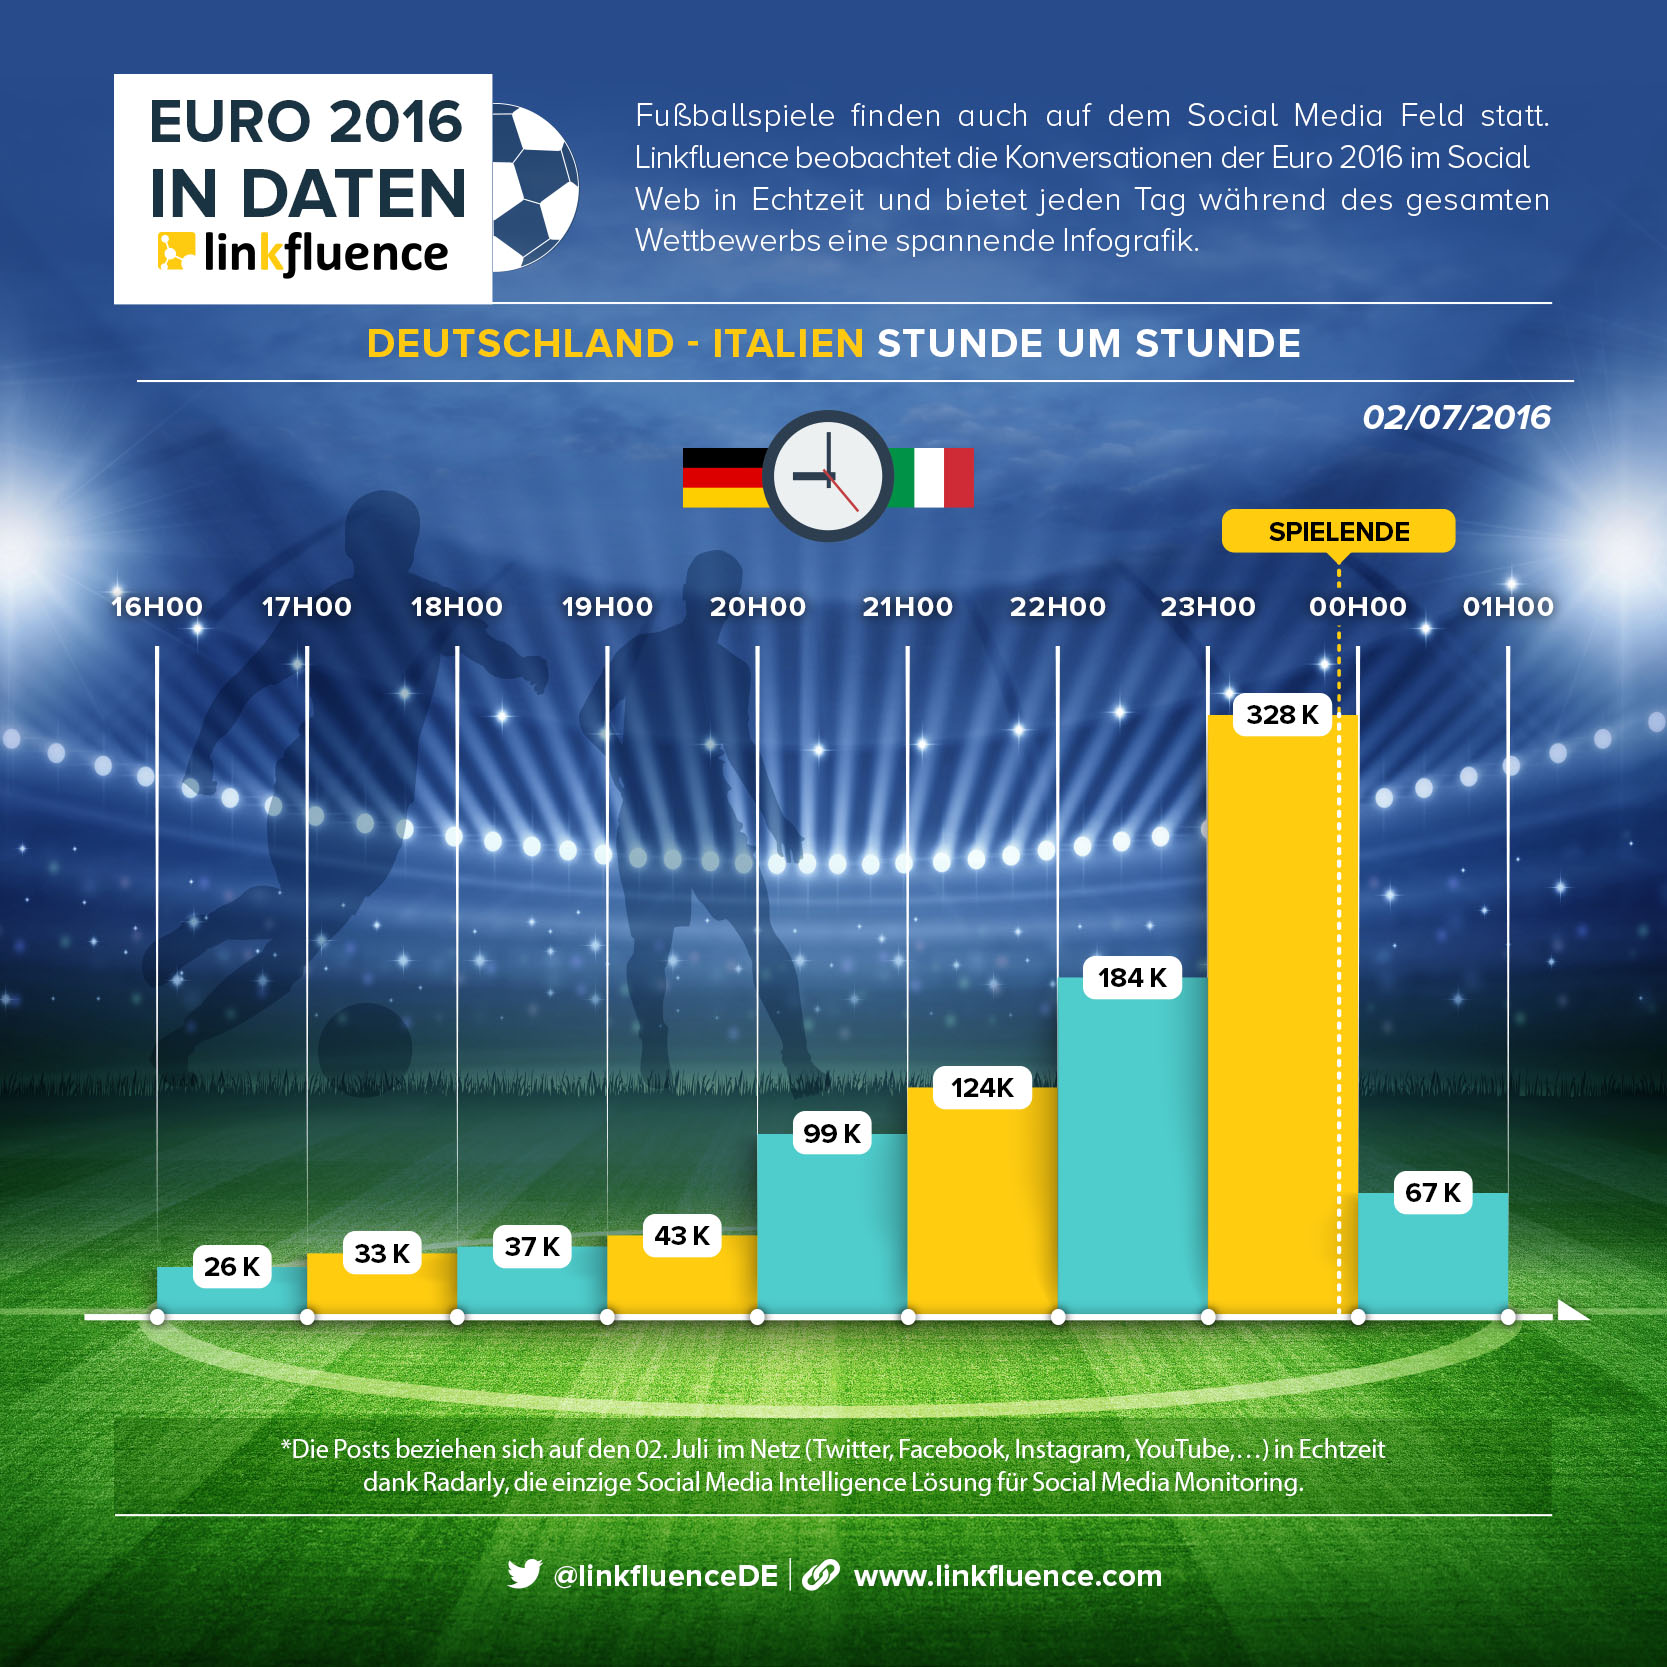 SEUL_EURO2016_CapsuleDigitale_Dimanche03-07_v1a